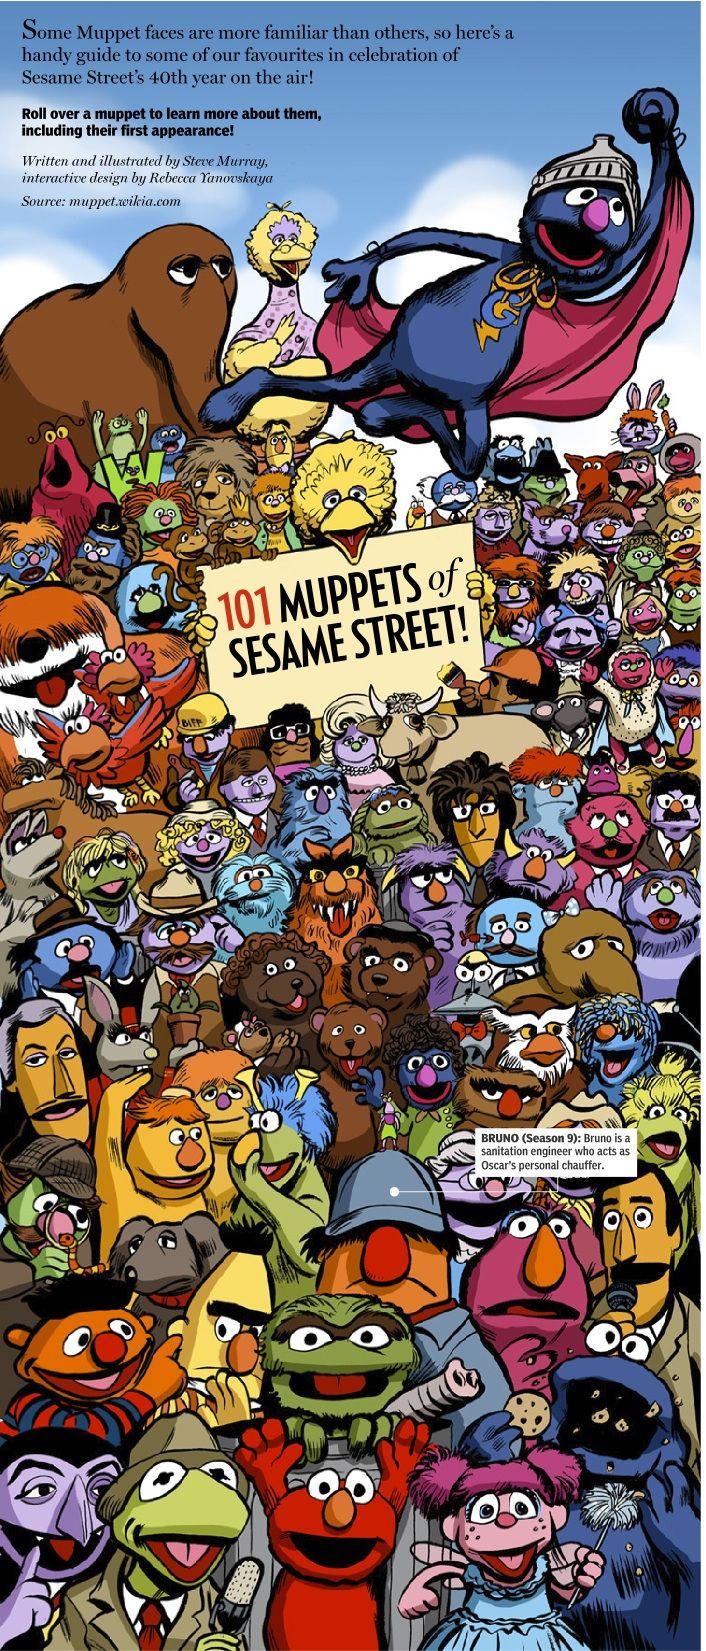 163 best Sesame Street / Muppets images on Pinterest ...